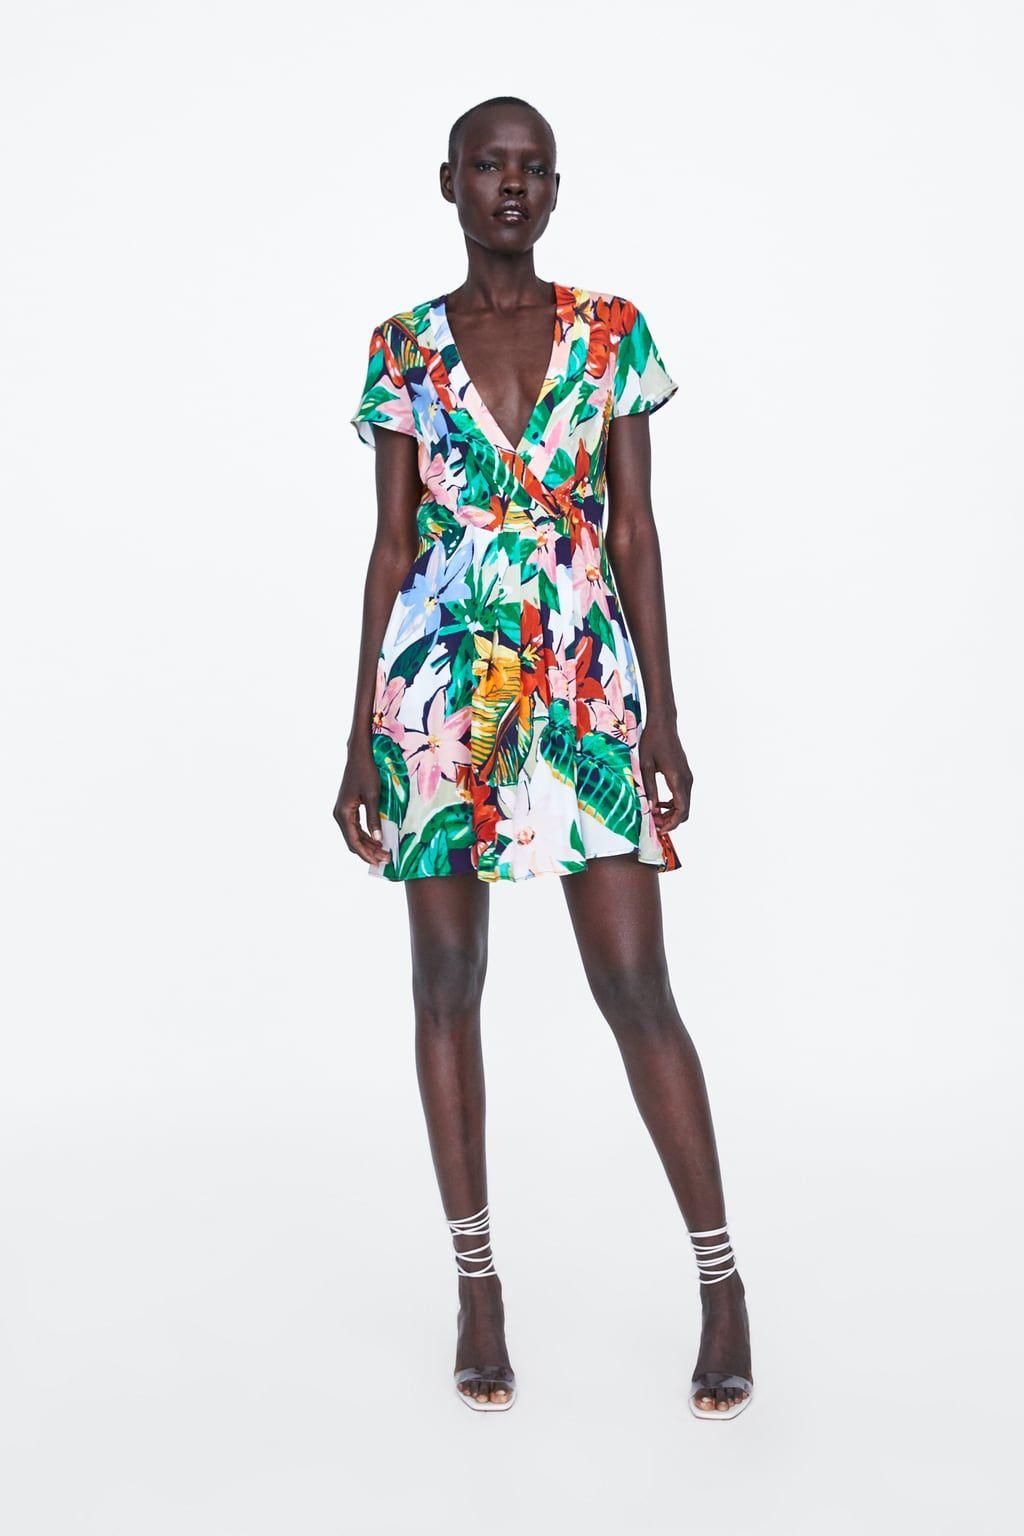 vestido estampado floral   vestiti, scollo a v, stampe floreali